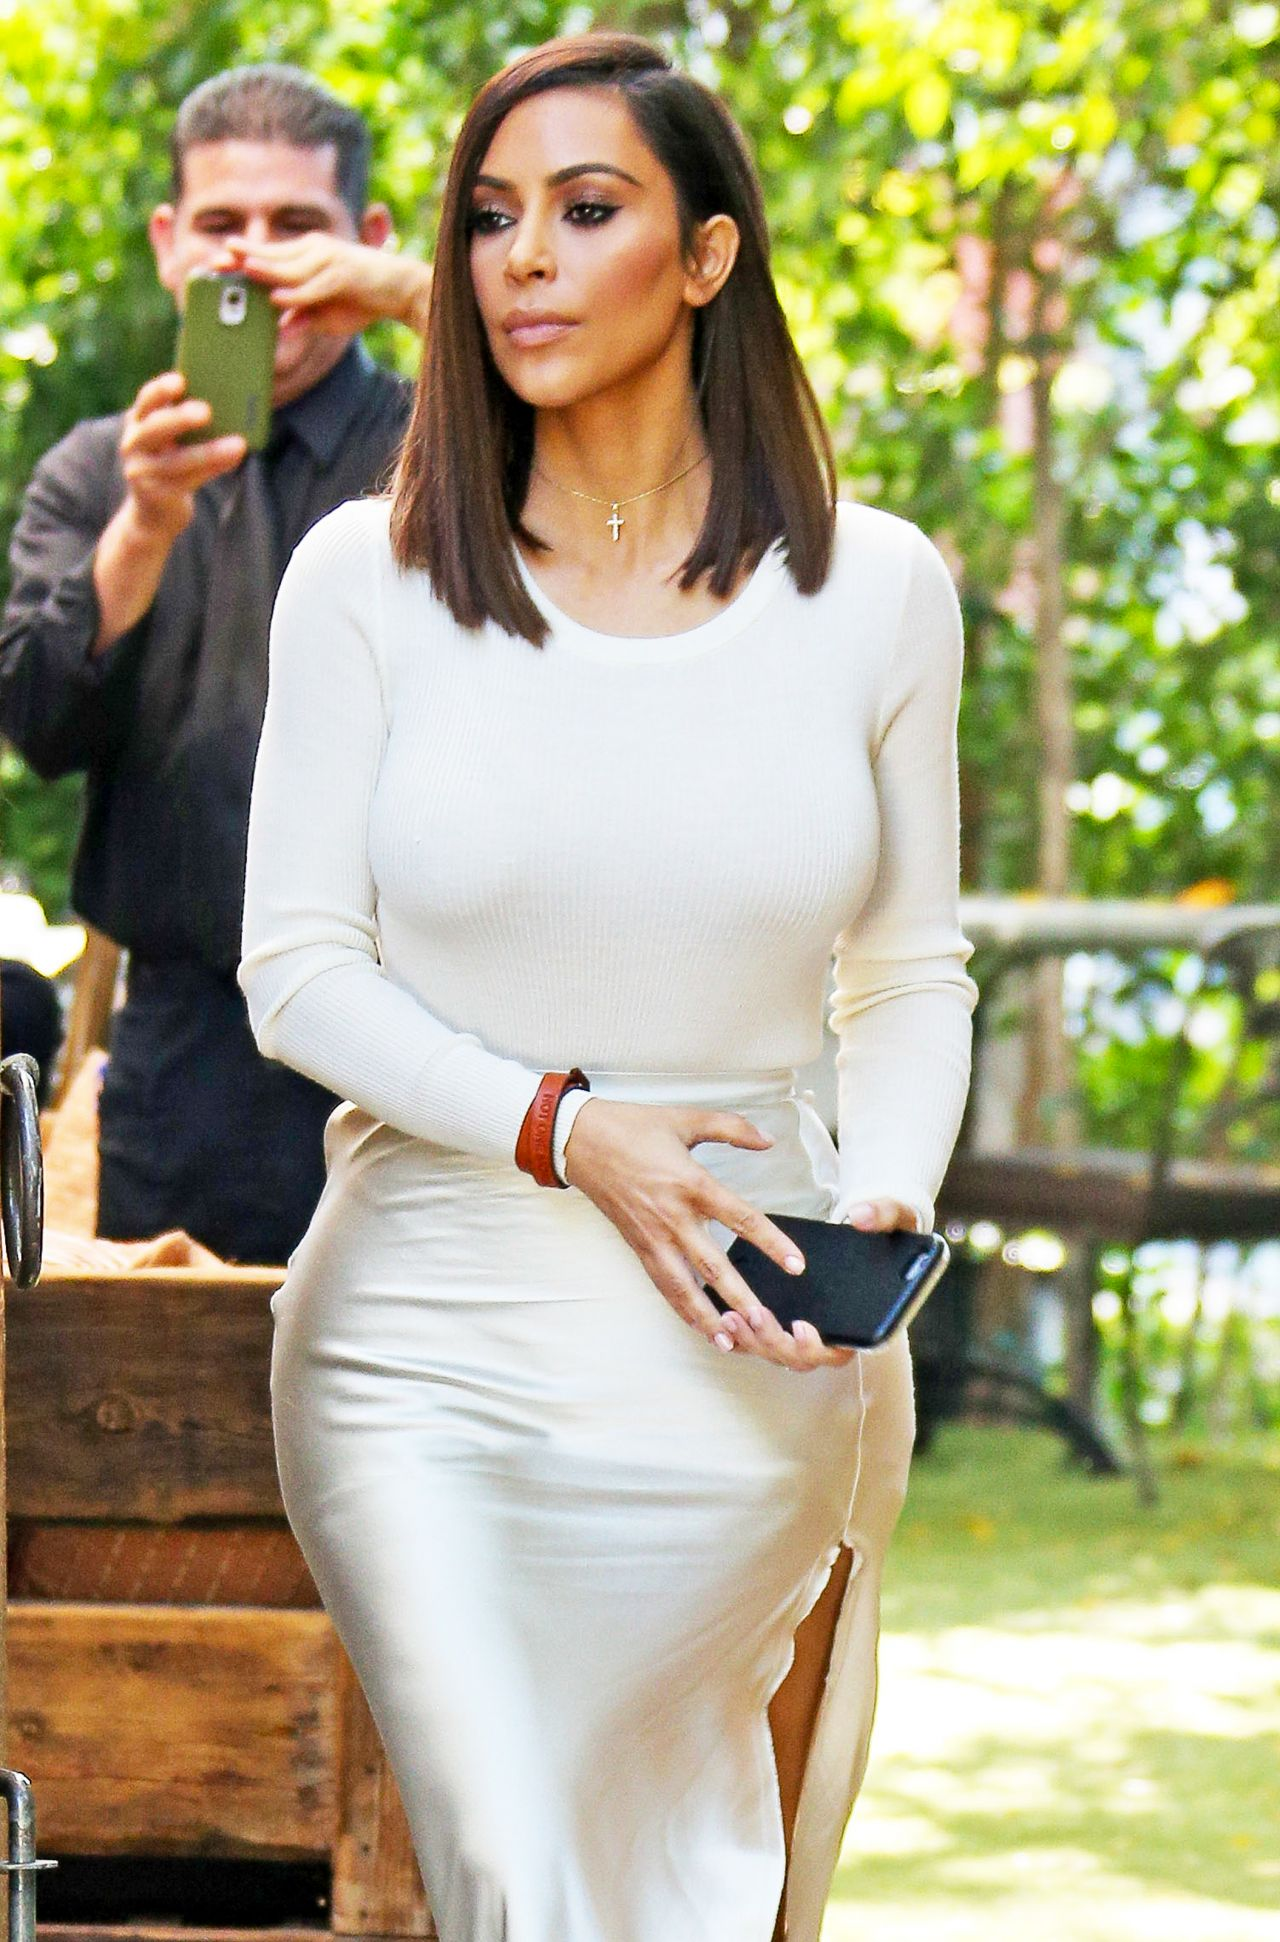 Kim Kardashian Classy Fashion - at The Villa Restaurant in ... Kim Kardashian